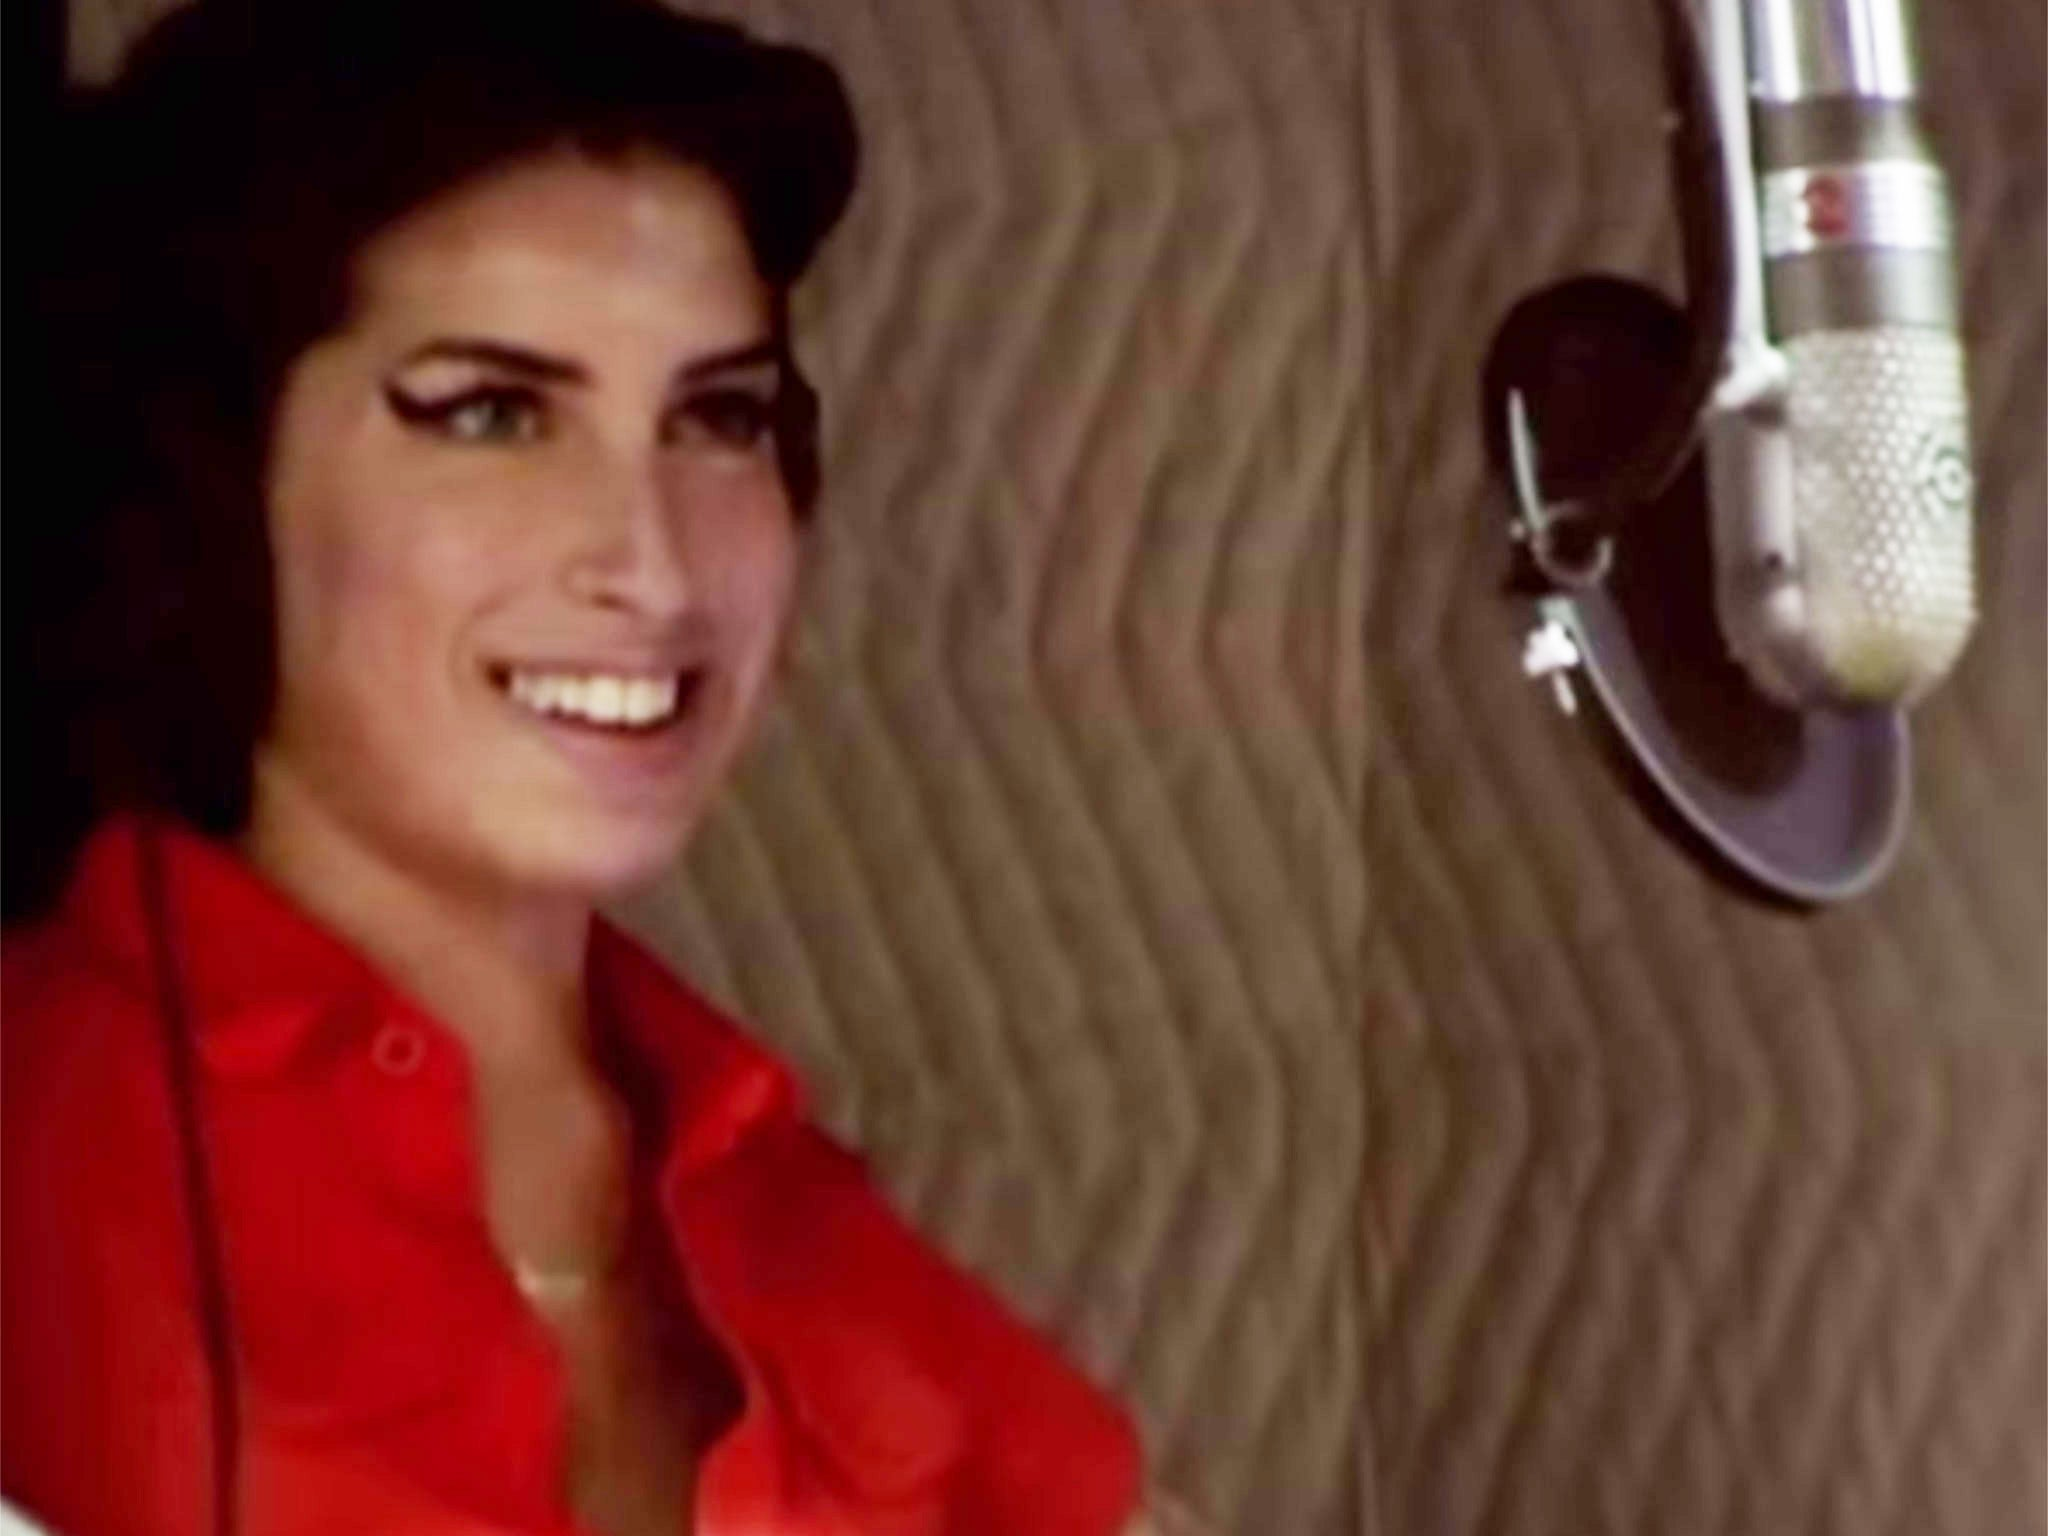 f16e0fc6c37f7 Amy Winehouse records 'Back to Black' in Asif Kapadia's new documentary